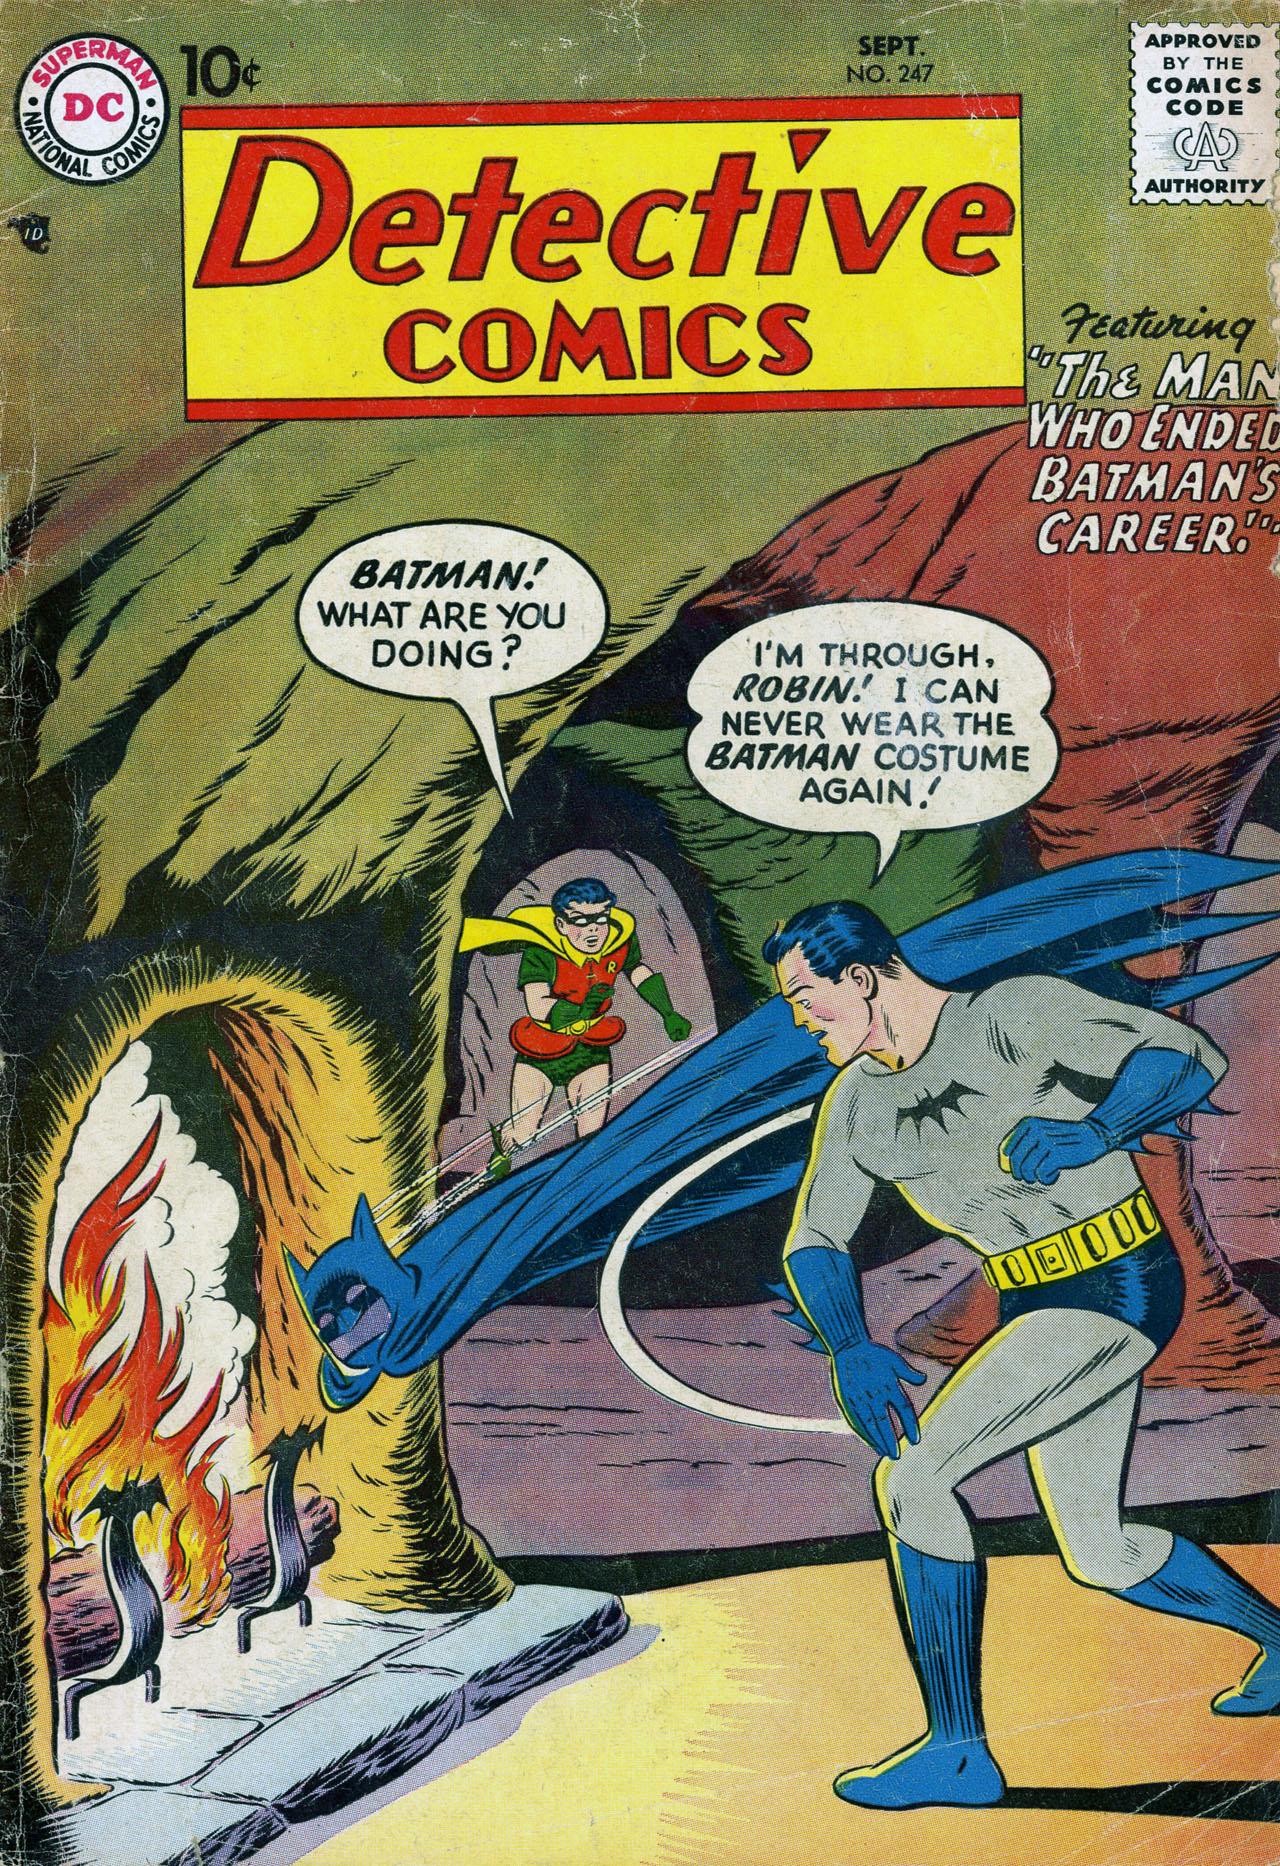 Read online Detective Comics (1937) comic -  Issue #247 - 1